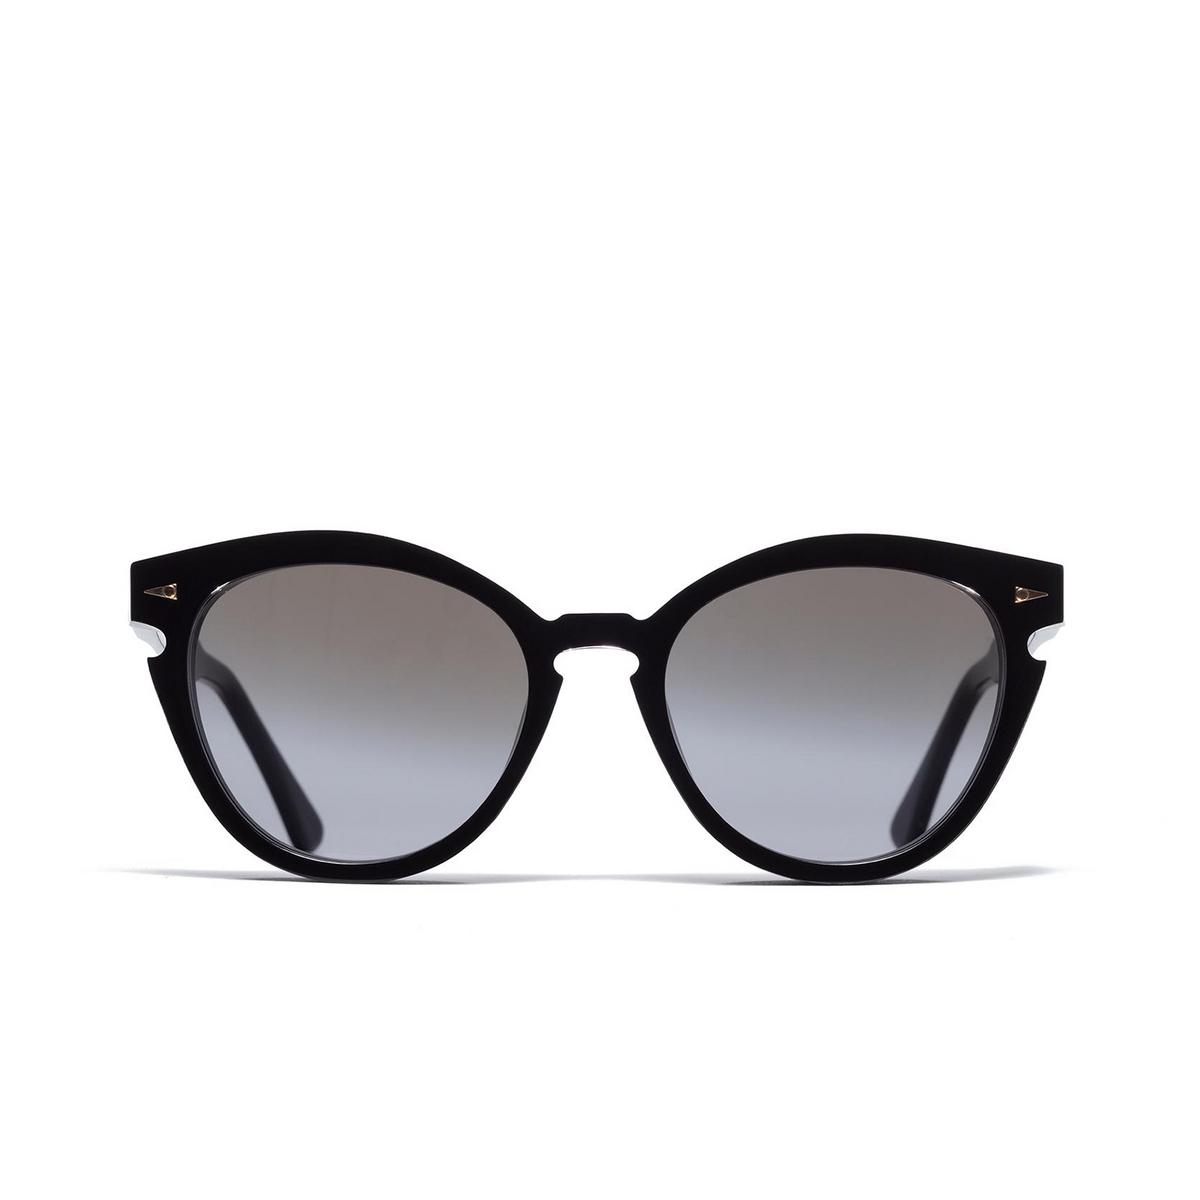 Ahlem® Cat-eye Sunglasses: Menilmontant color Black.